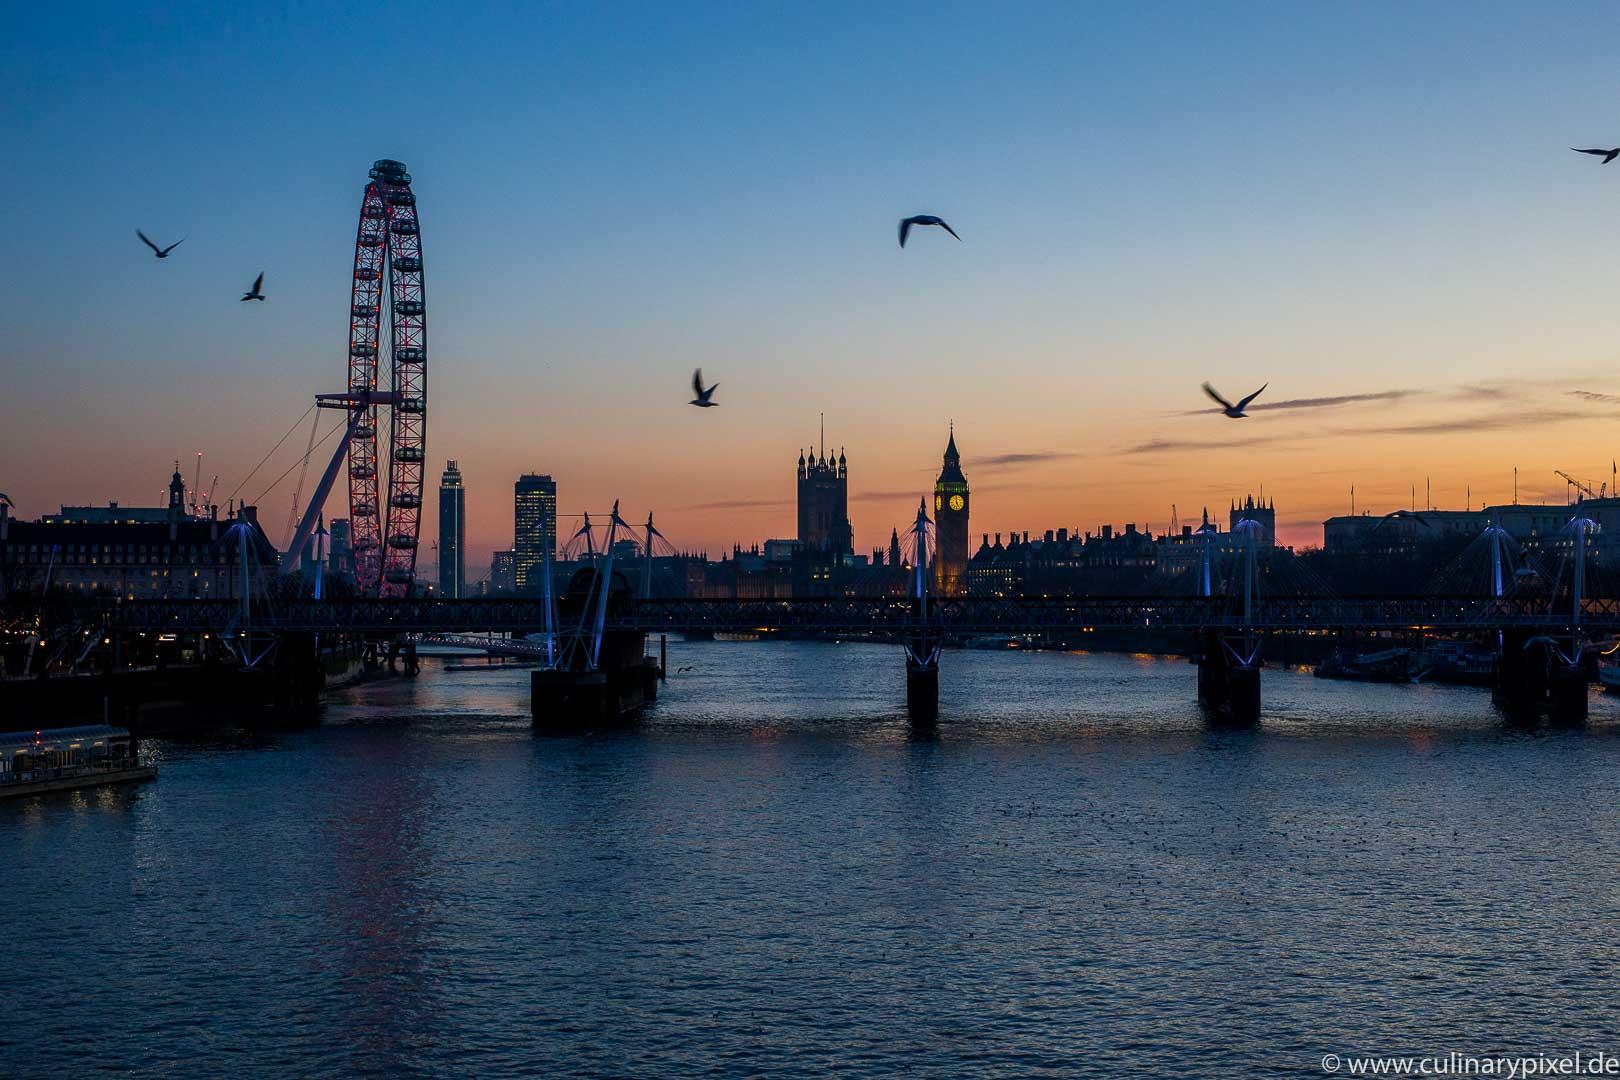 London Sonnenuntergang Spaziergang über die Themse